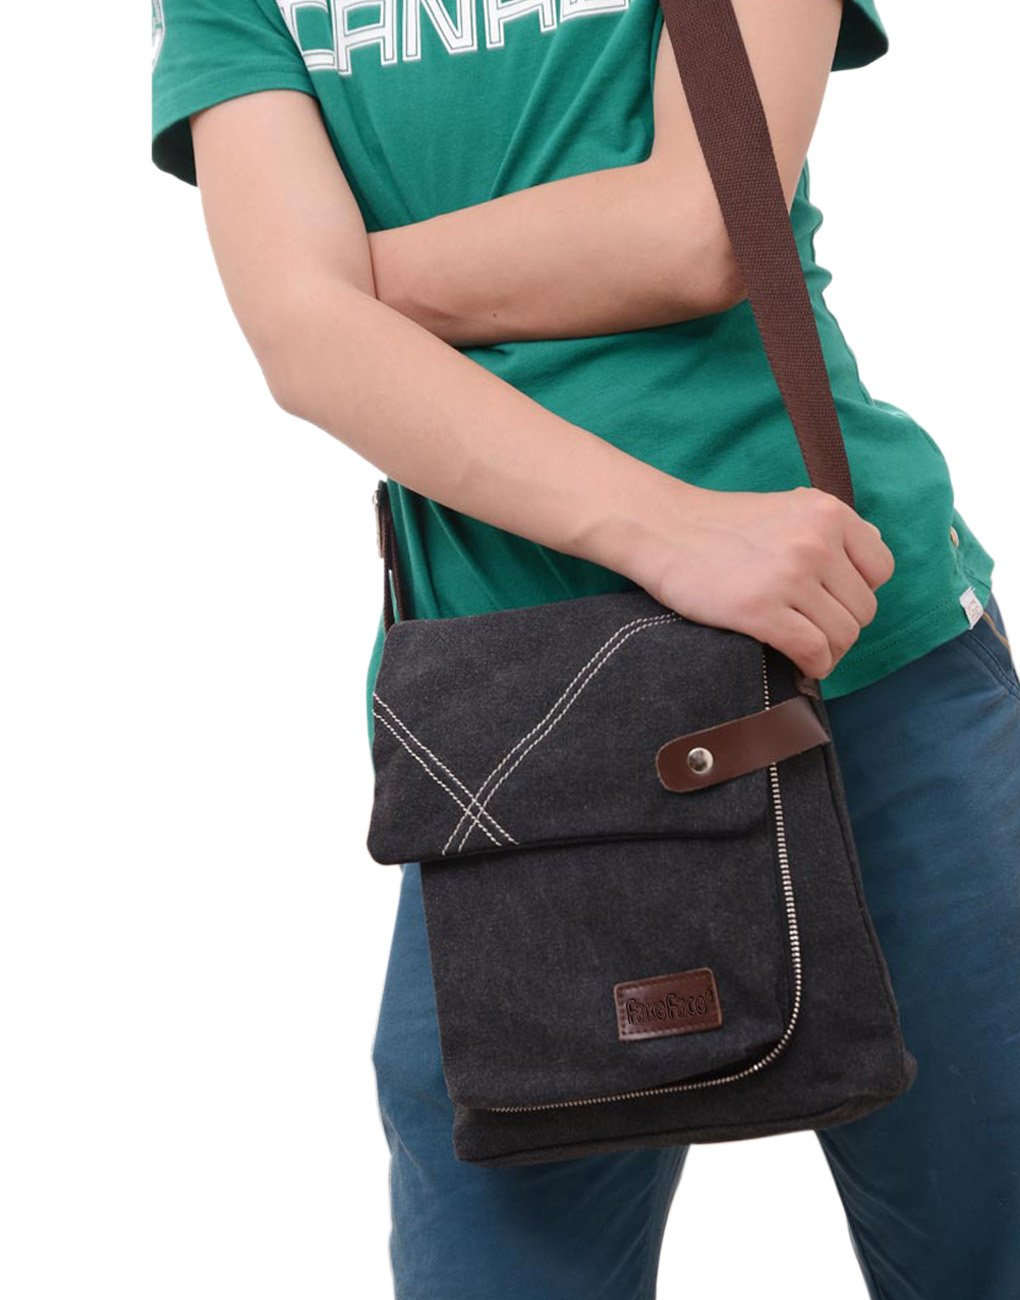 Mens Vintage Canvas Messenger Cross Body Bag Travel Casual Small Shoulder Bag Pack